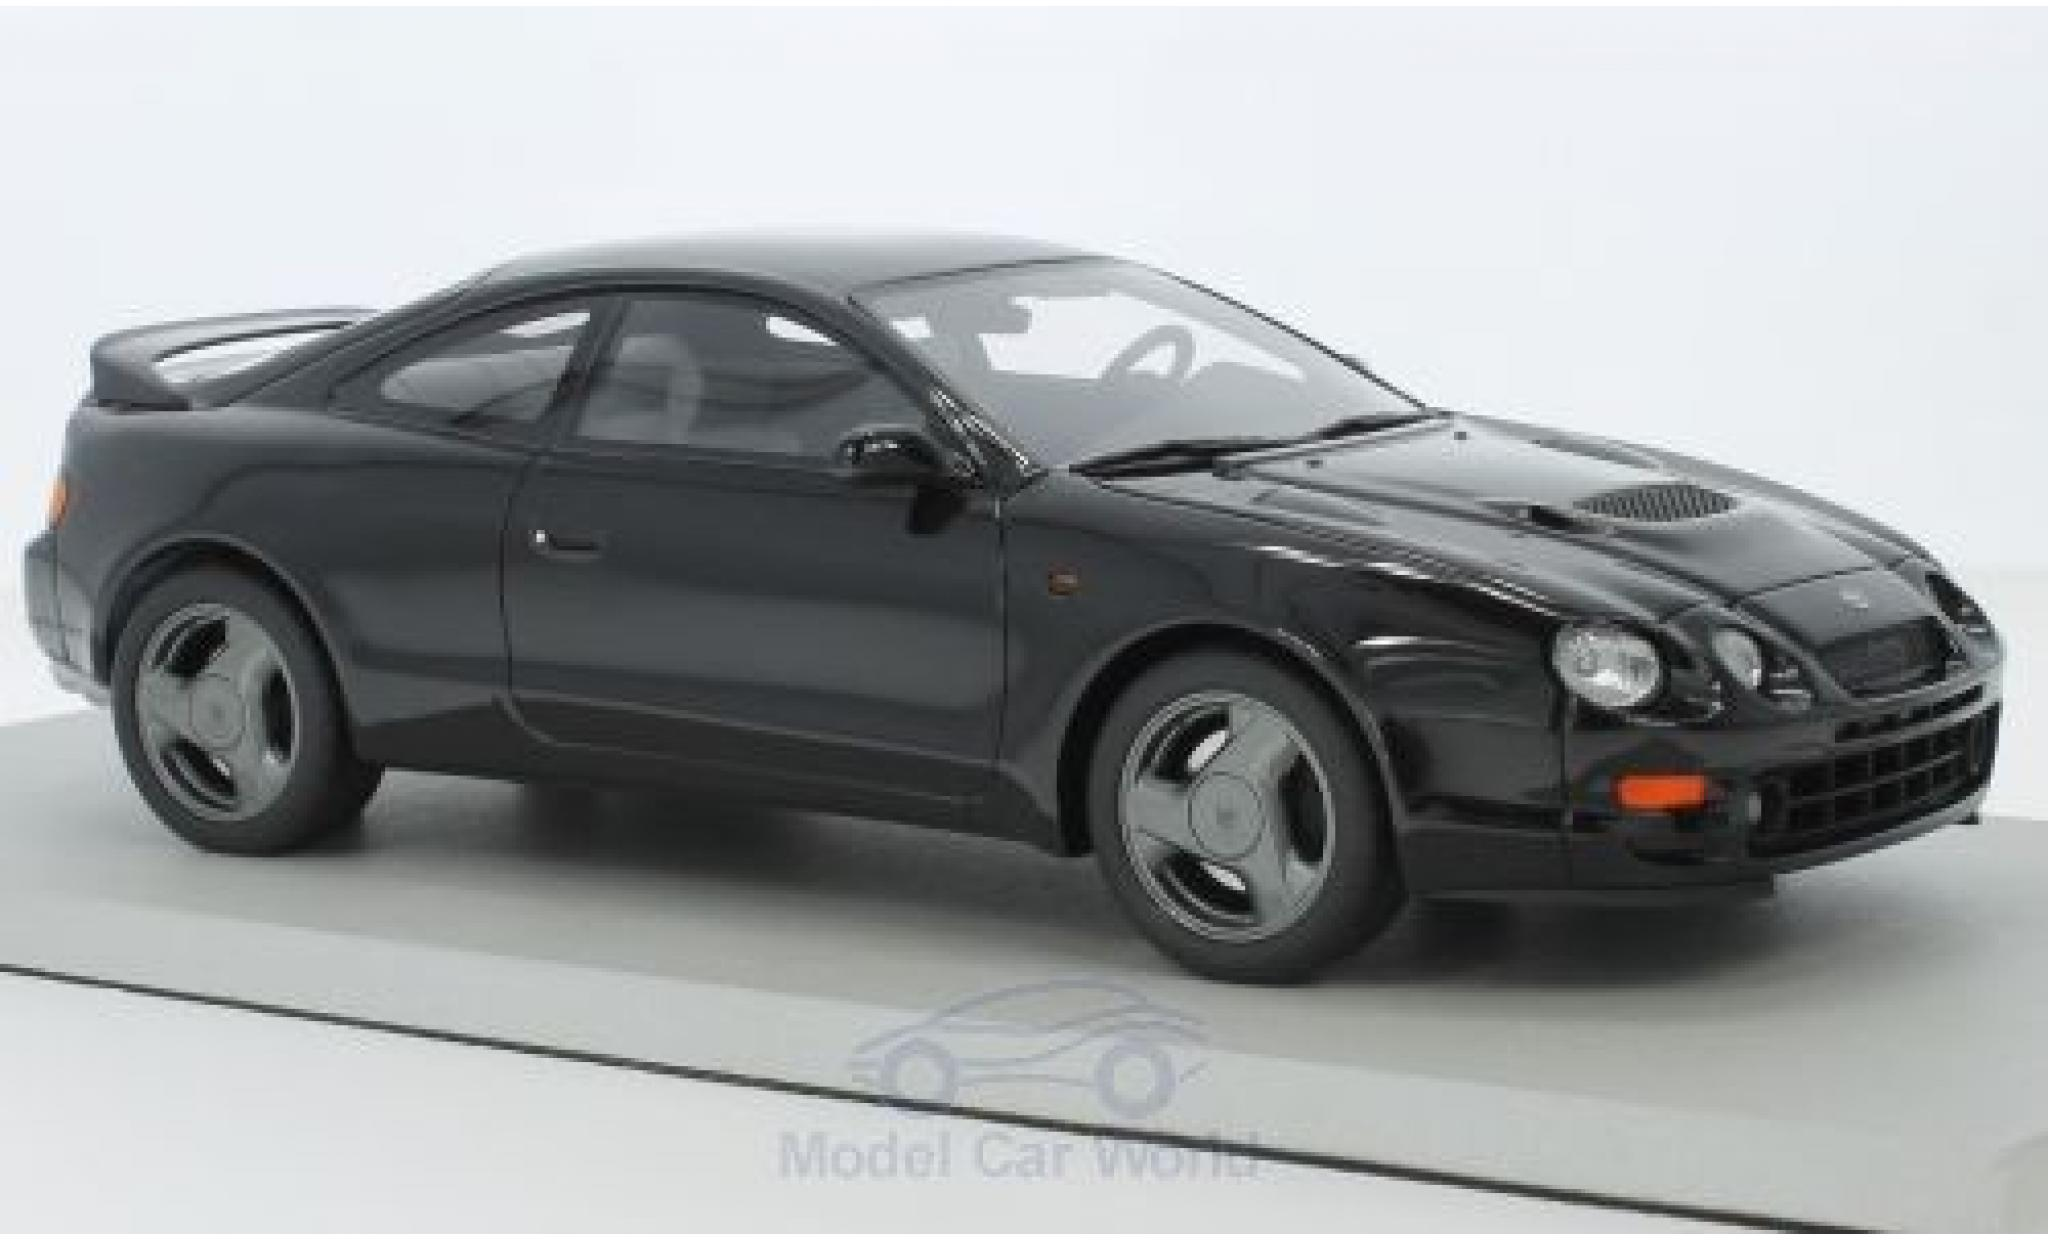 Toyota Celica 1/18 Lucky Step Models ST 205 black